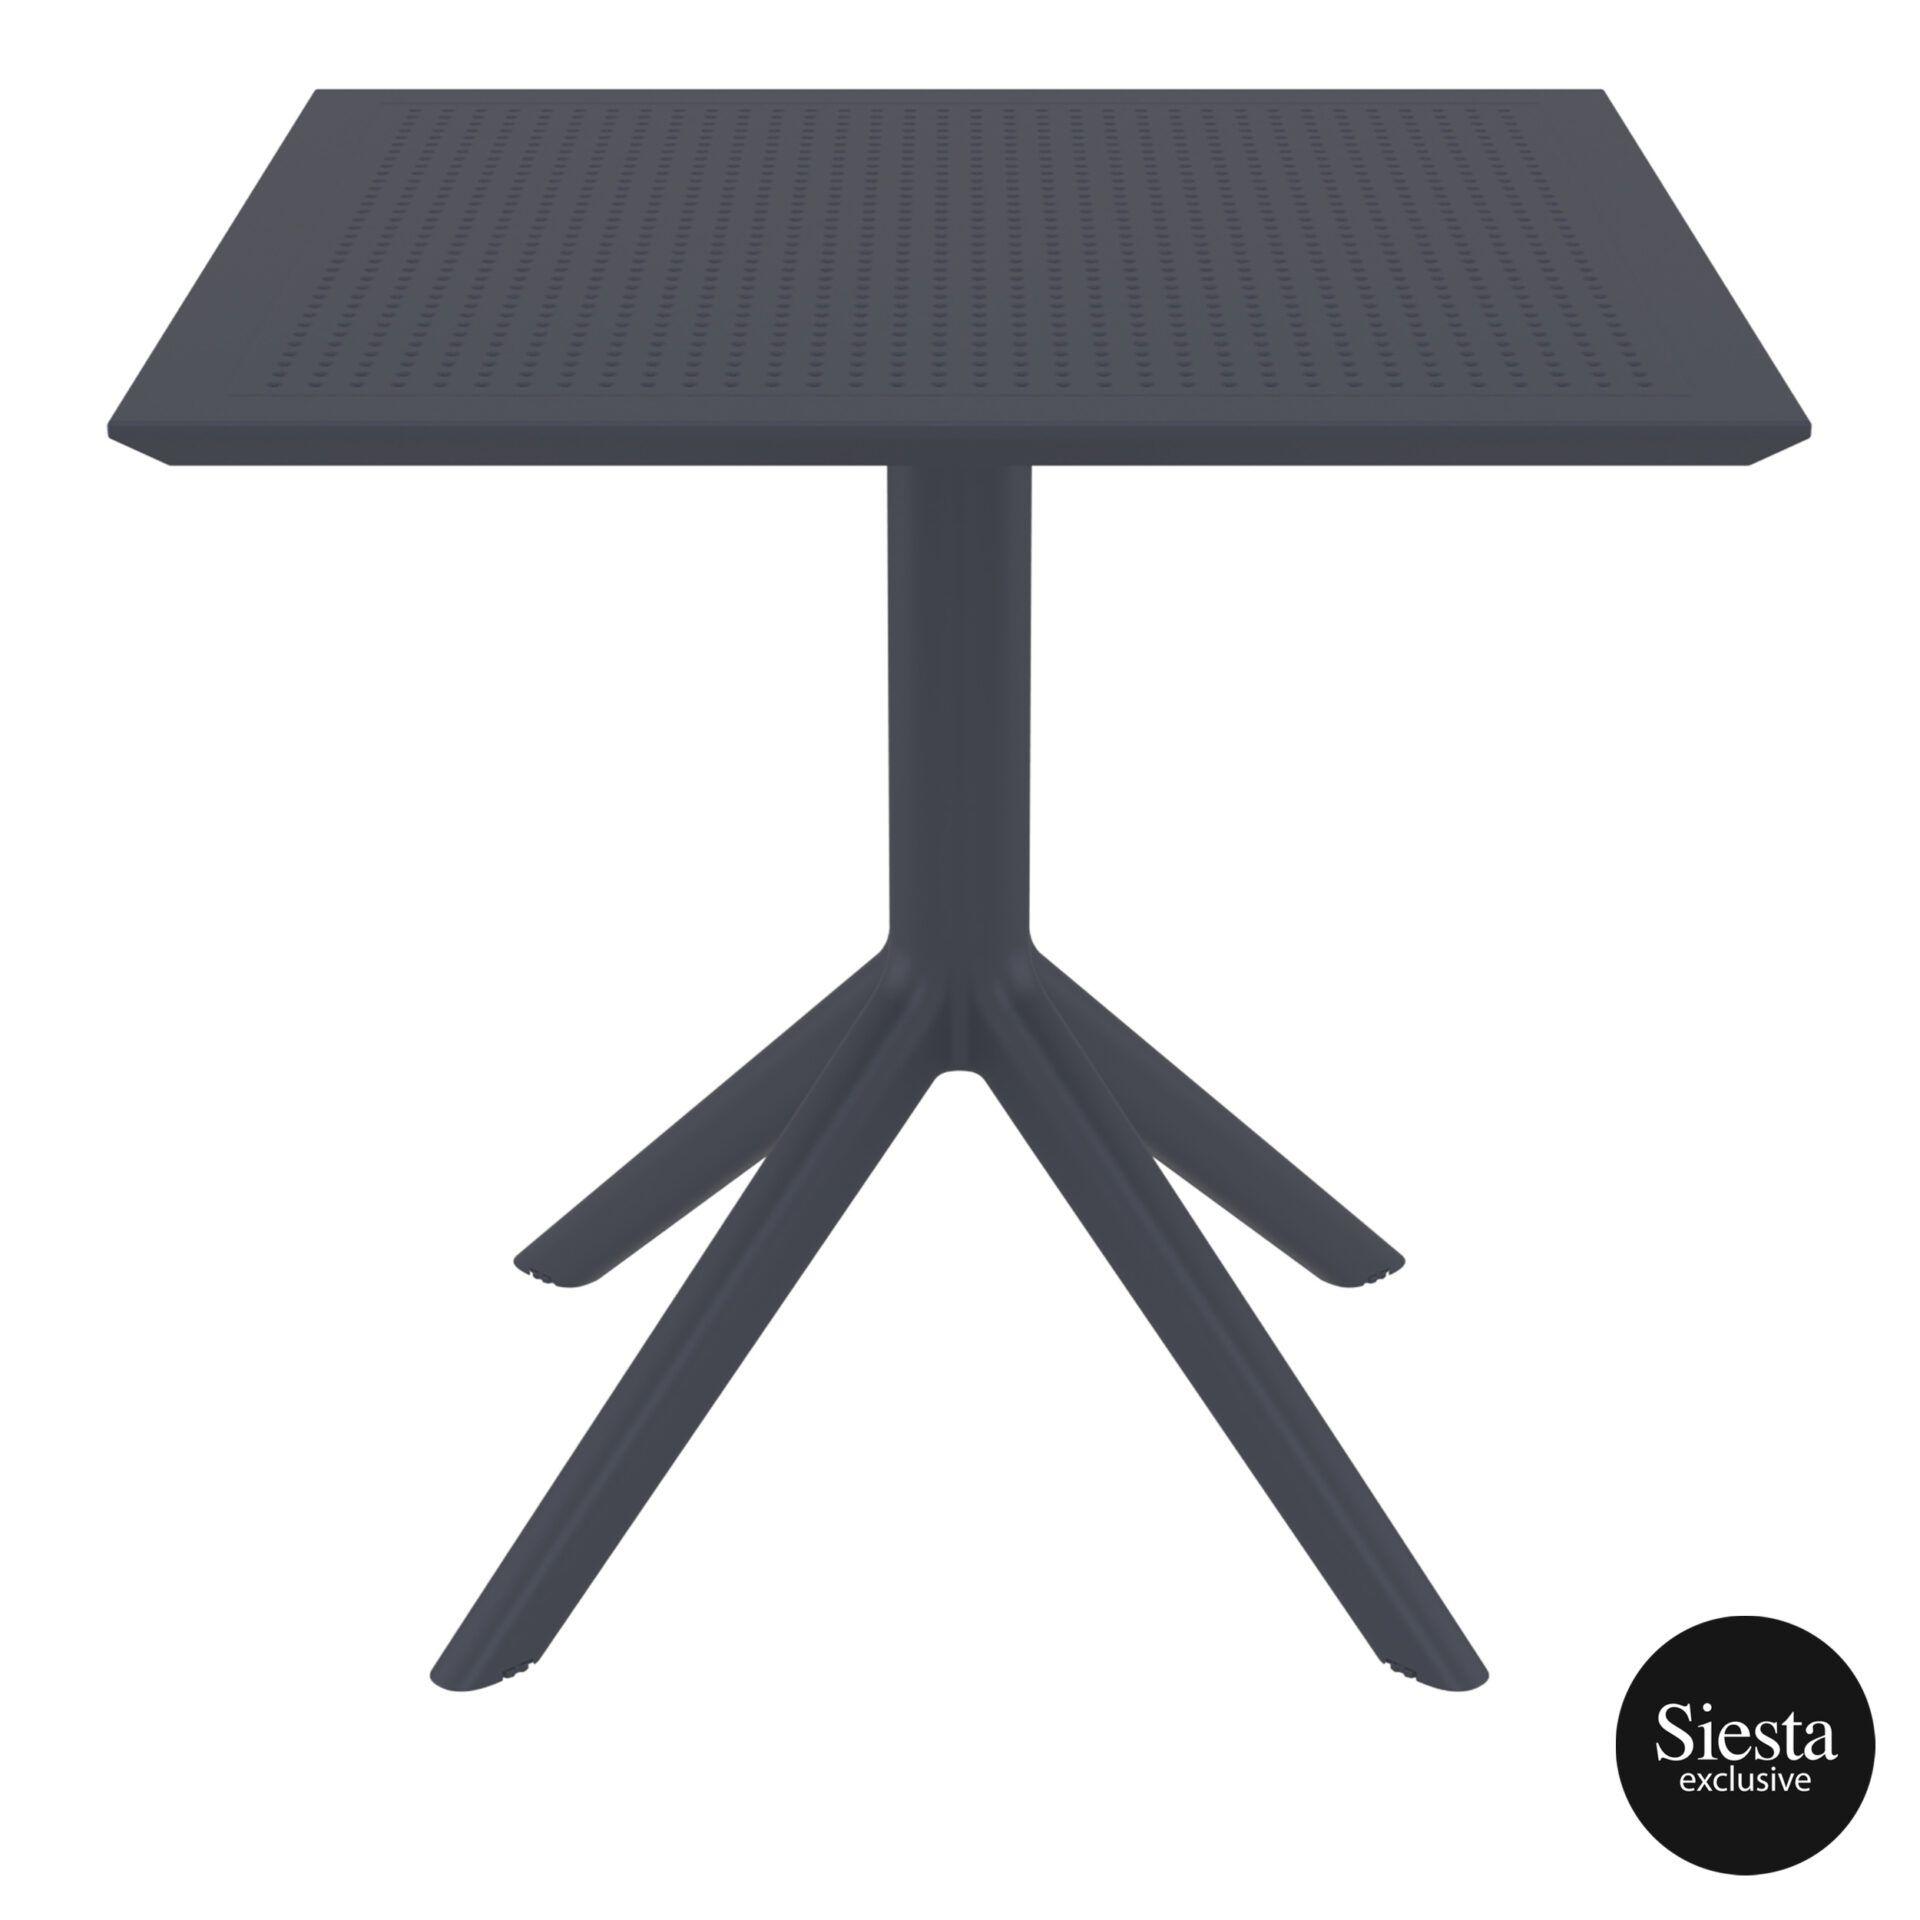 polypropylene outdoor cafe sky table 80 darkgrey front 2